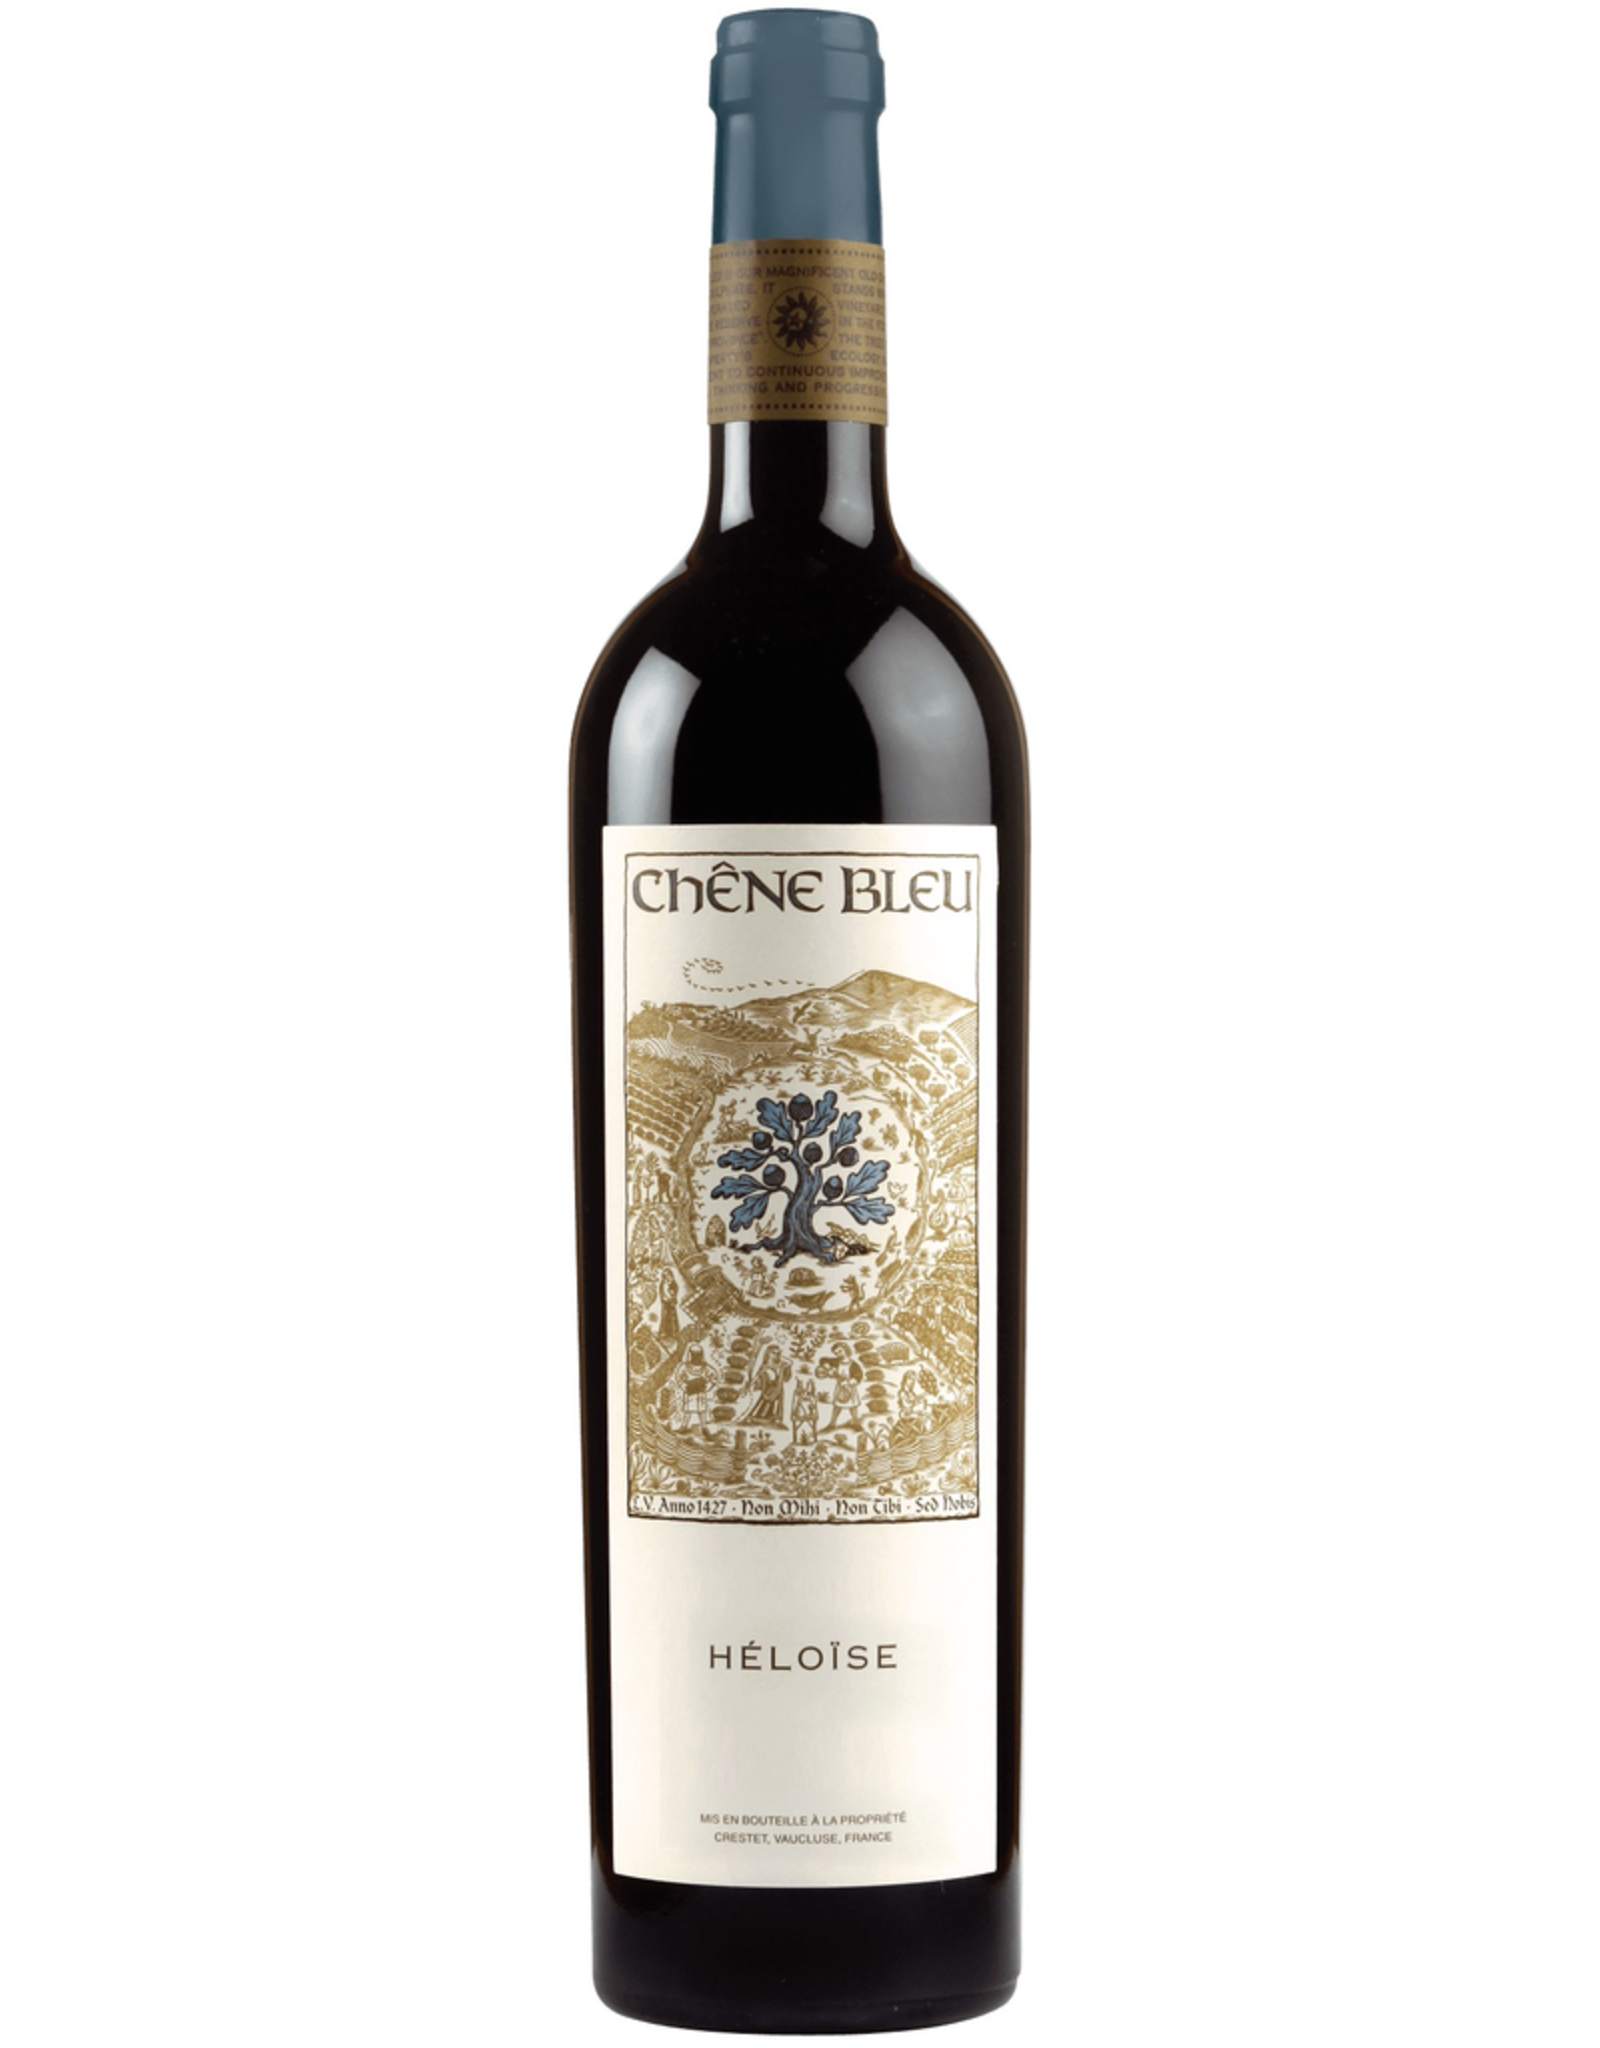 Rose Wine 2009, Chene Bleu Heloise, Red Blend, Vaucluse, Vin De Pays, France, 14.5% Alc, CT